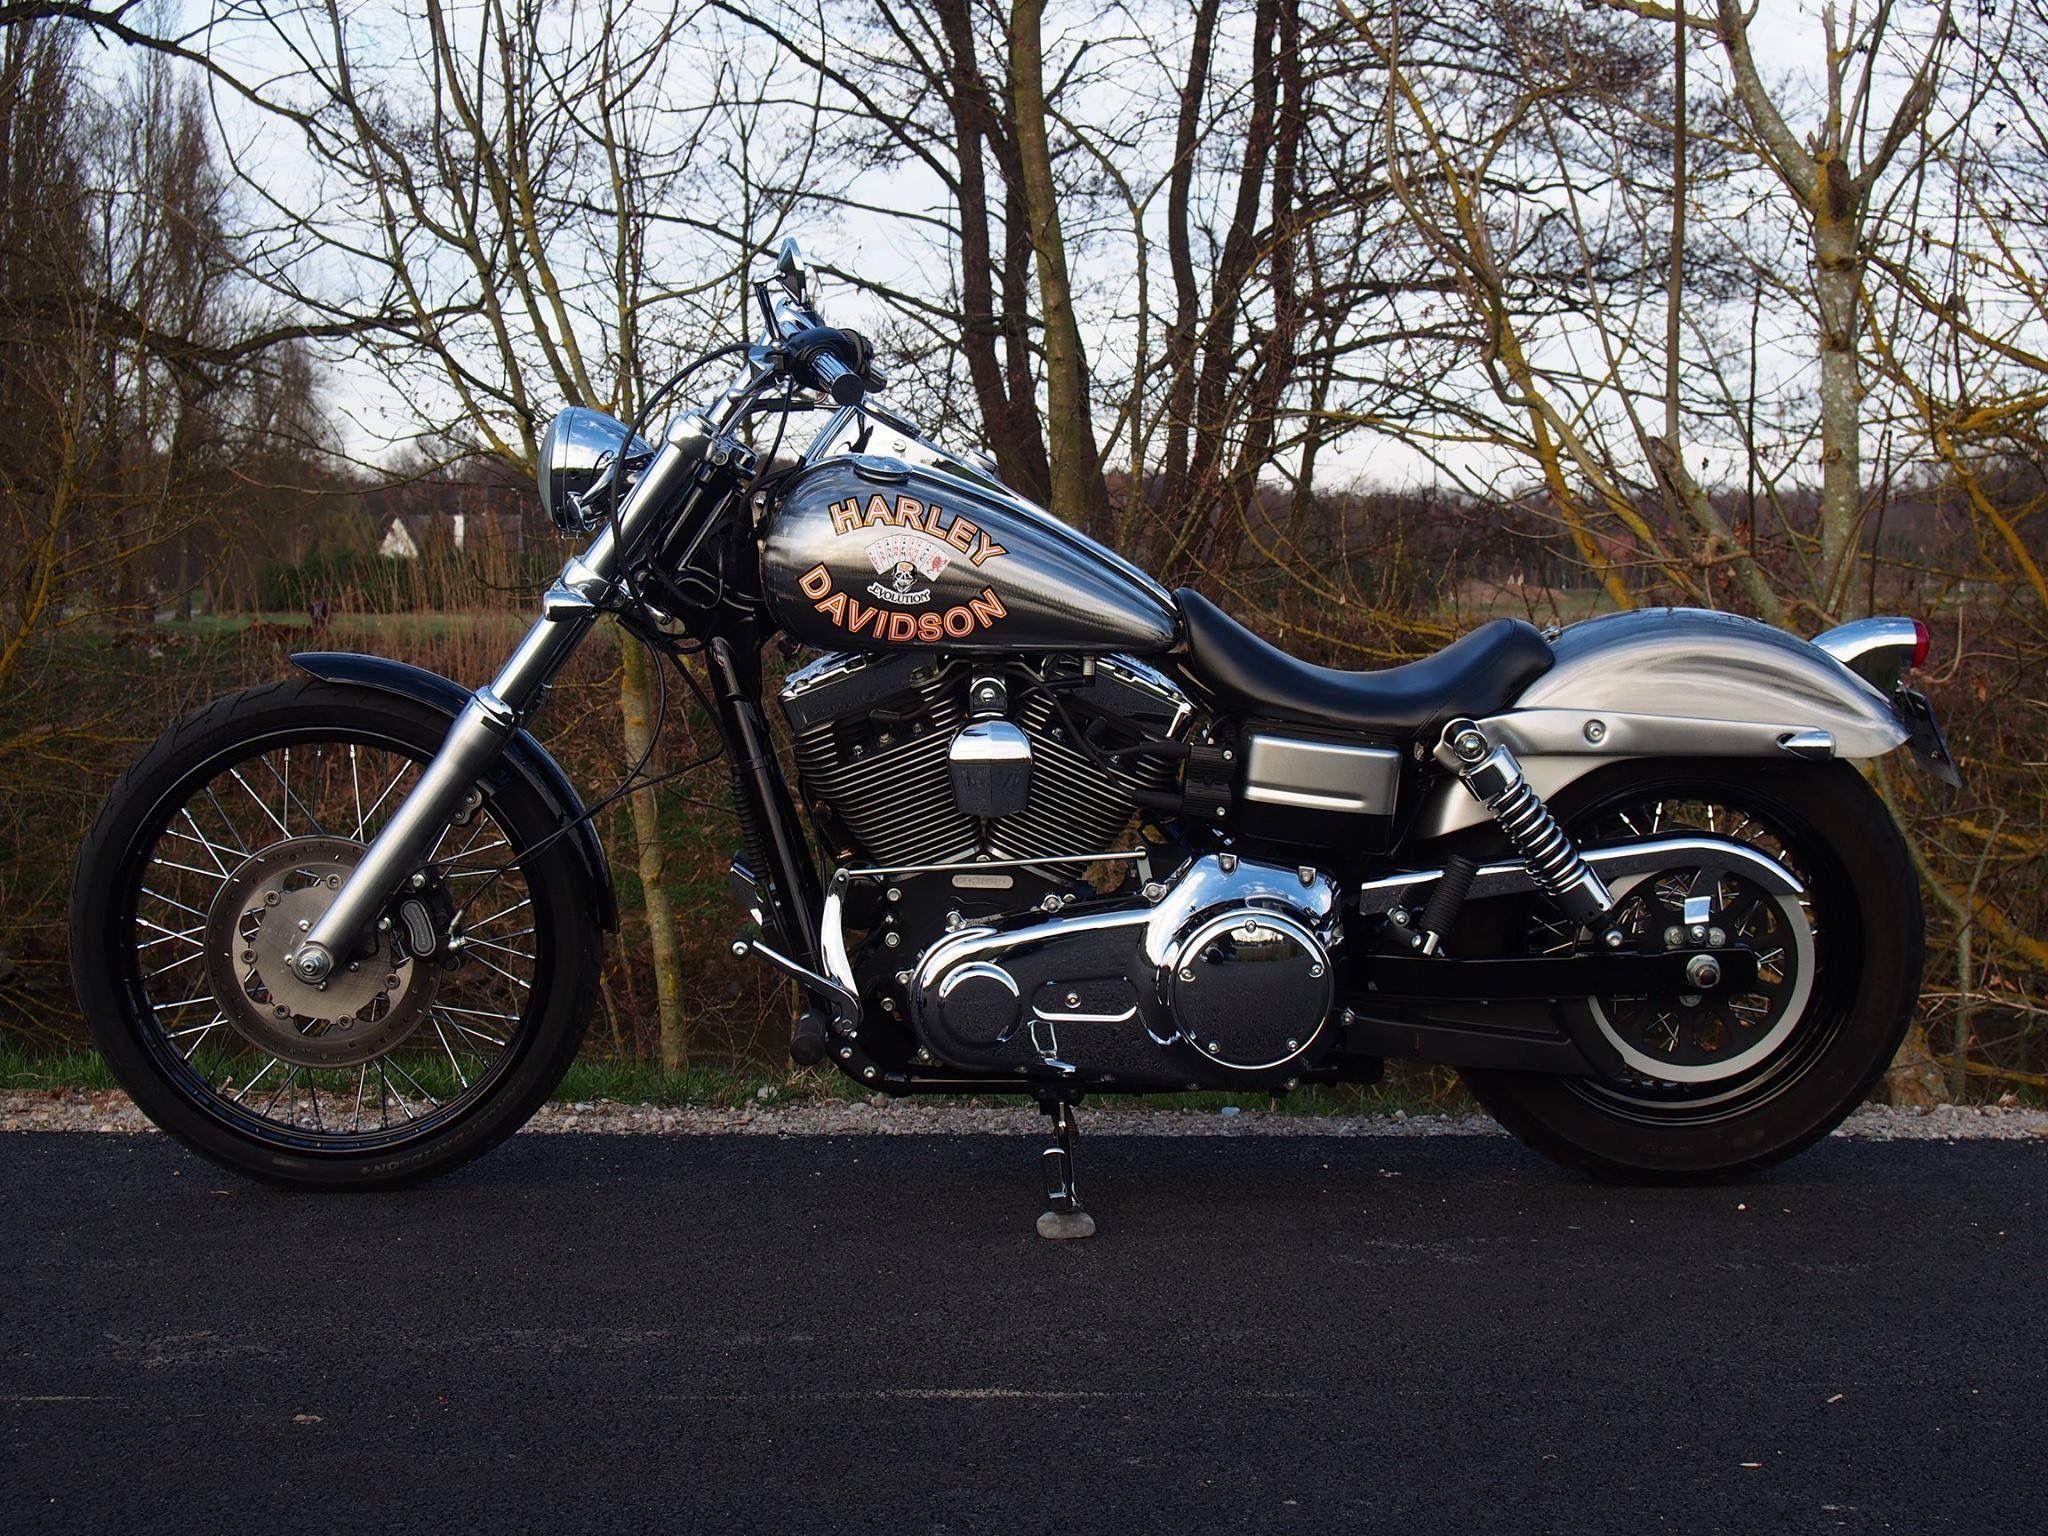 Wide Glide Harley Davidson And The Marlboro Man Replica Harley Davidson Dyna Harley Bikes Harley Davidson Motorcycles